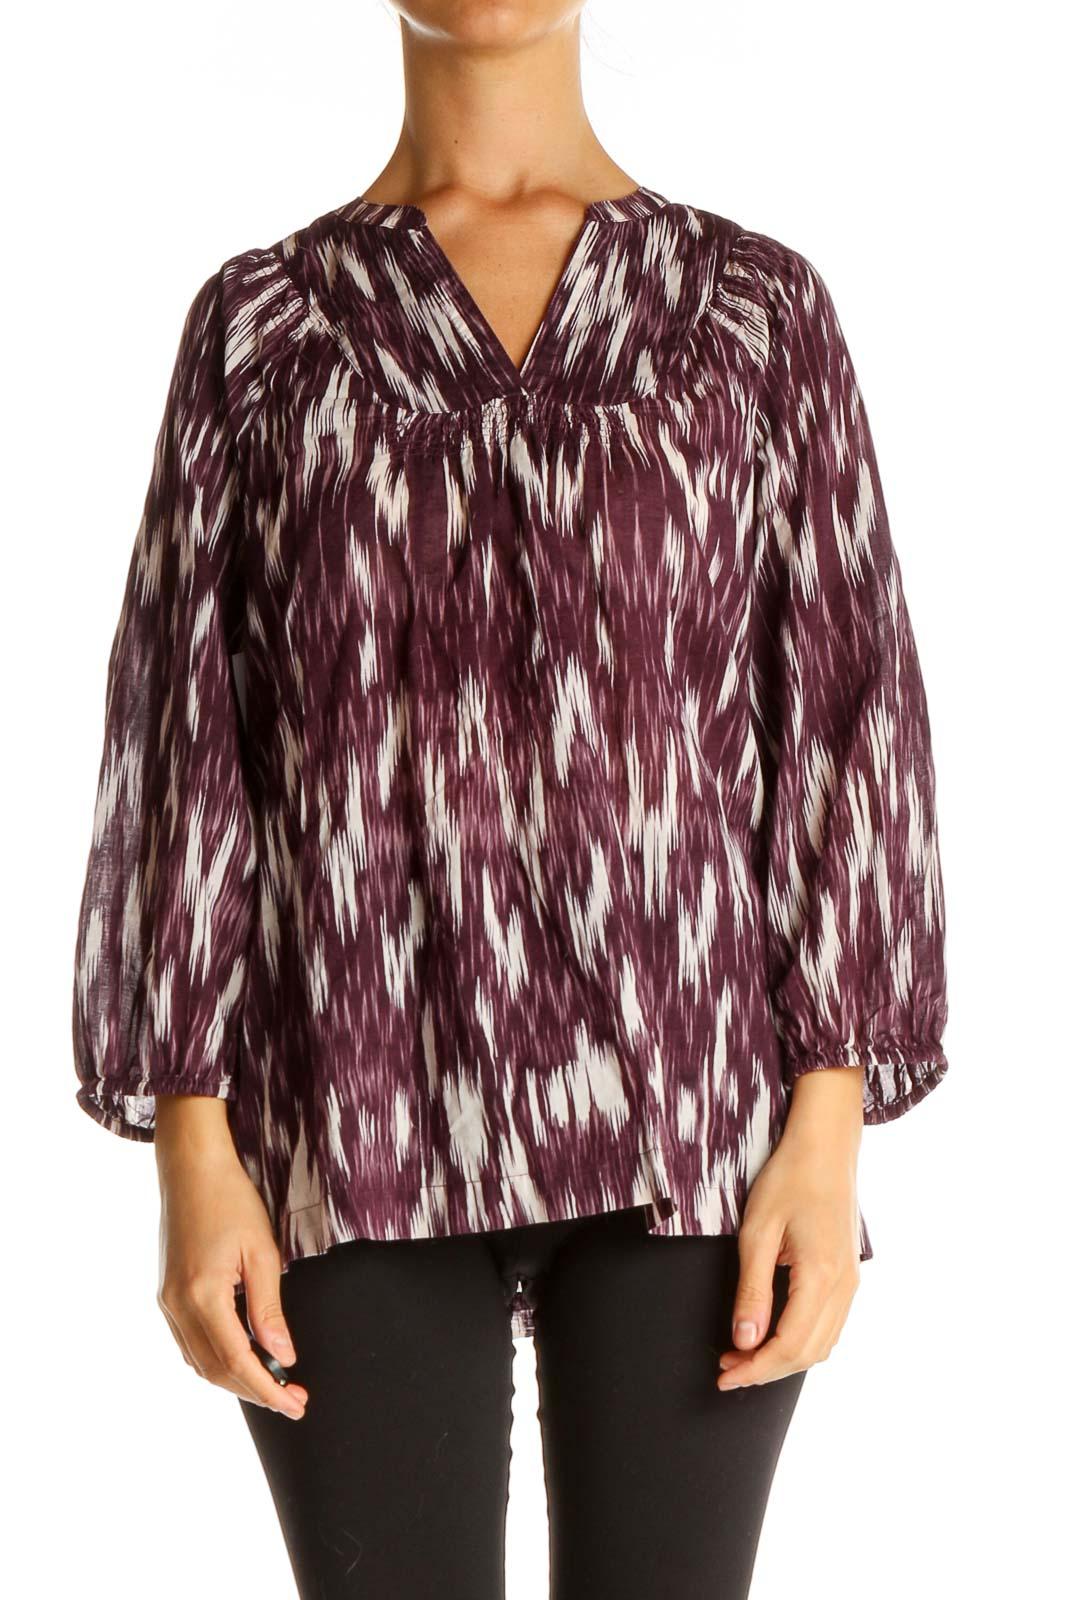 Purple Geometric Print All Day Wear Blouse Front